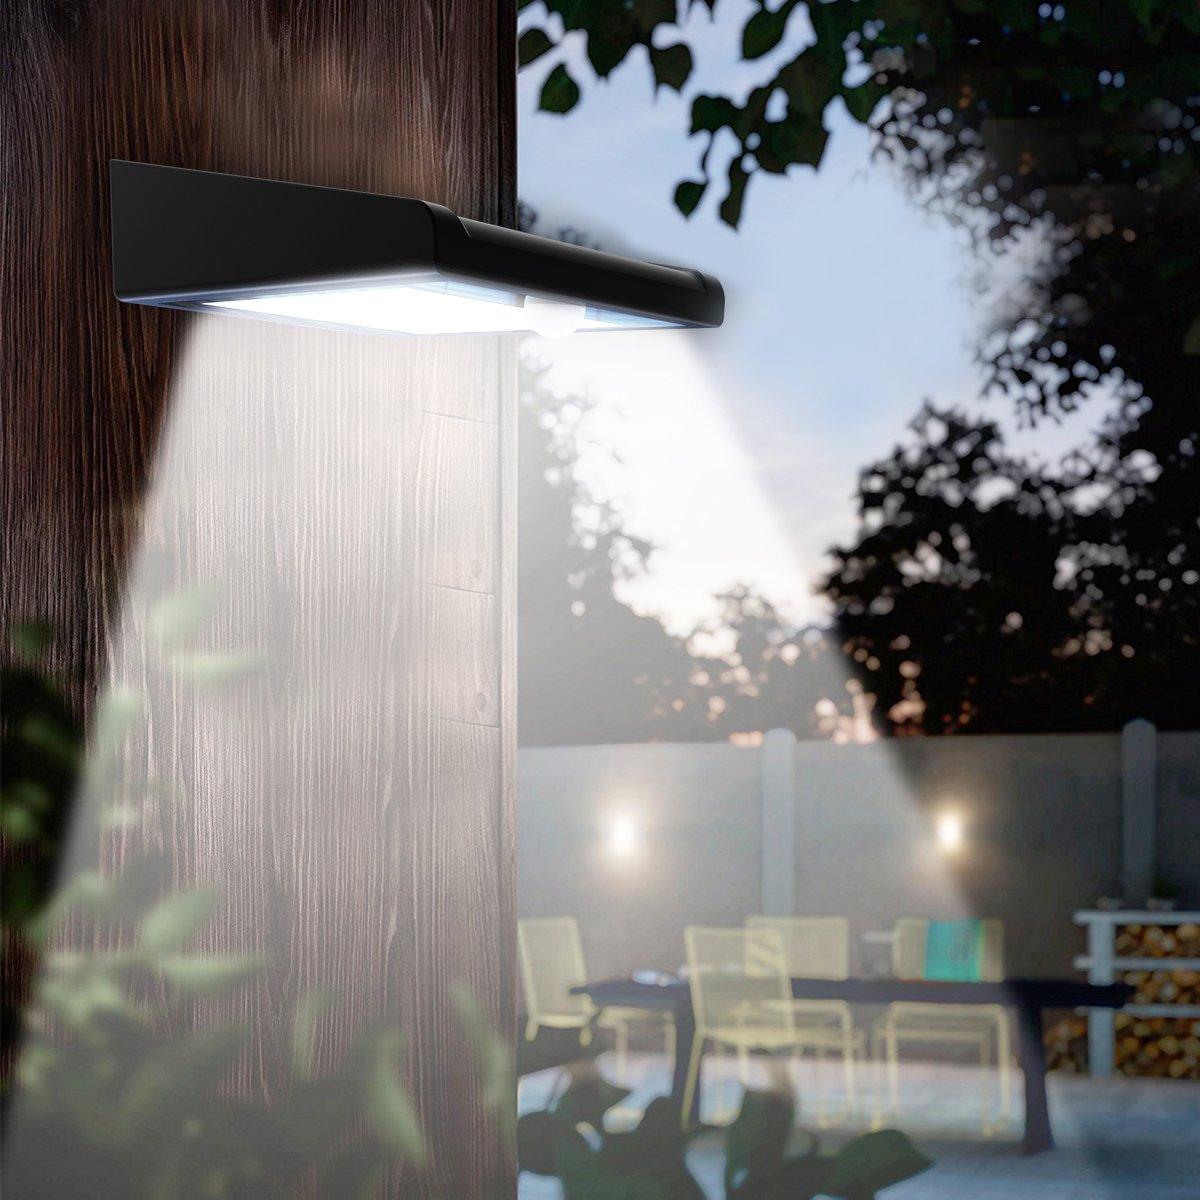 2 Pack 30 LED Solar Lights Outdoor, Avaspot【Upgraded Version】Solar Powered Security Light, Wireless Waterproof Motion Sensor Solar Light, Outdoor Wall Light for Patio, Deck, Garden, Garage by Avaspot